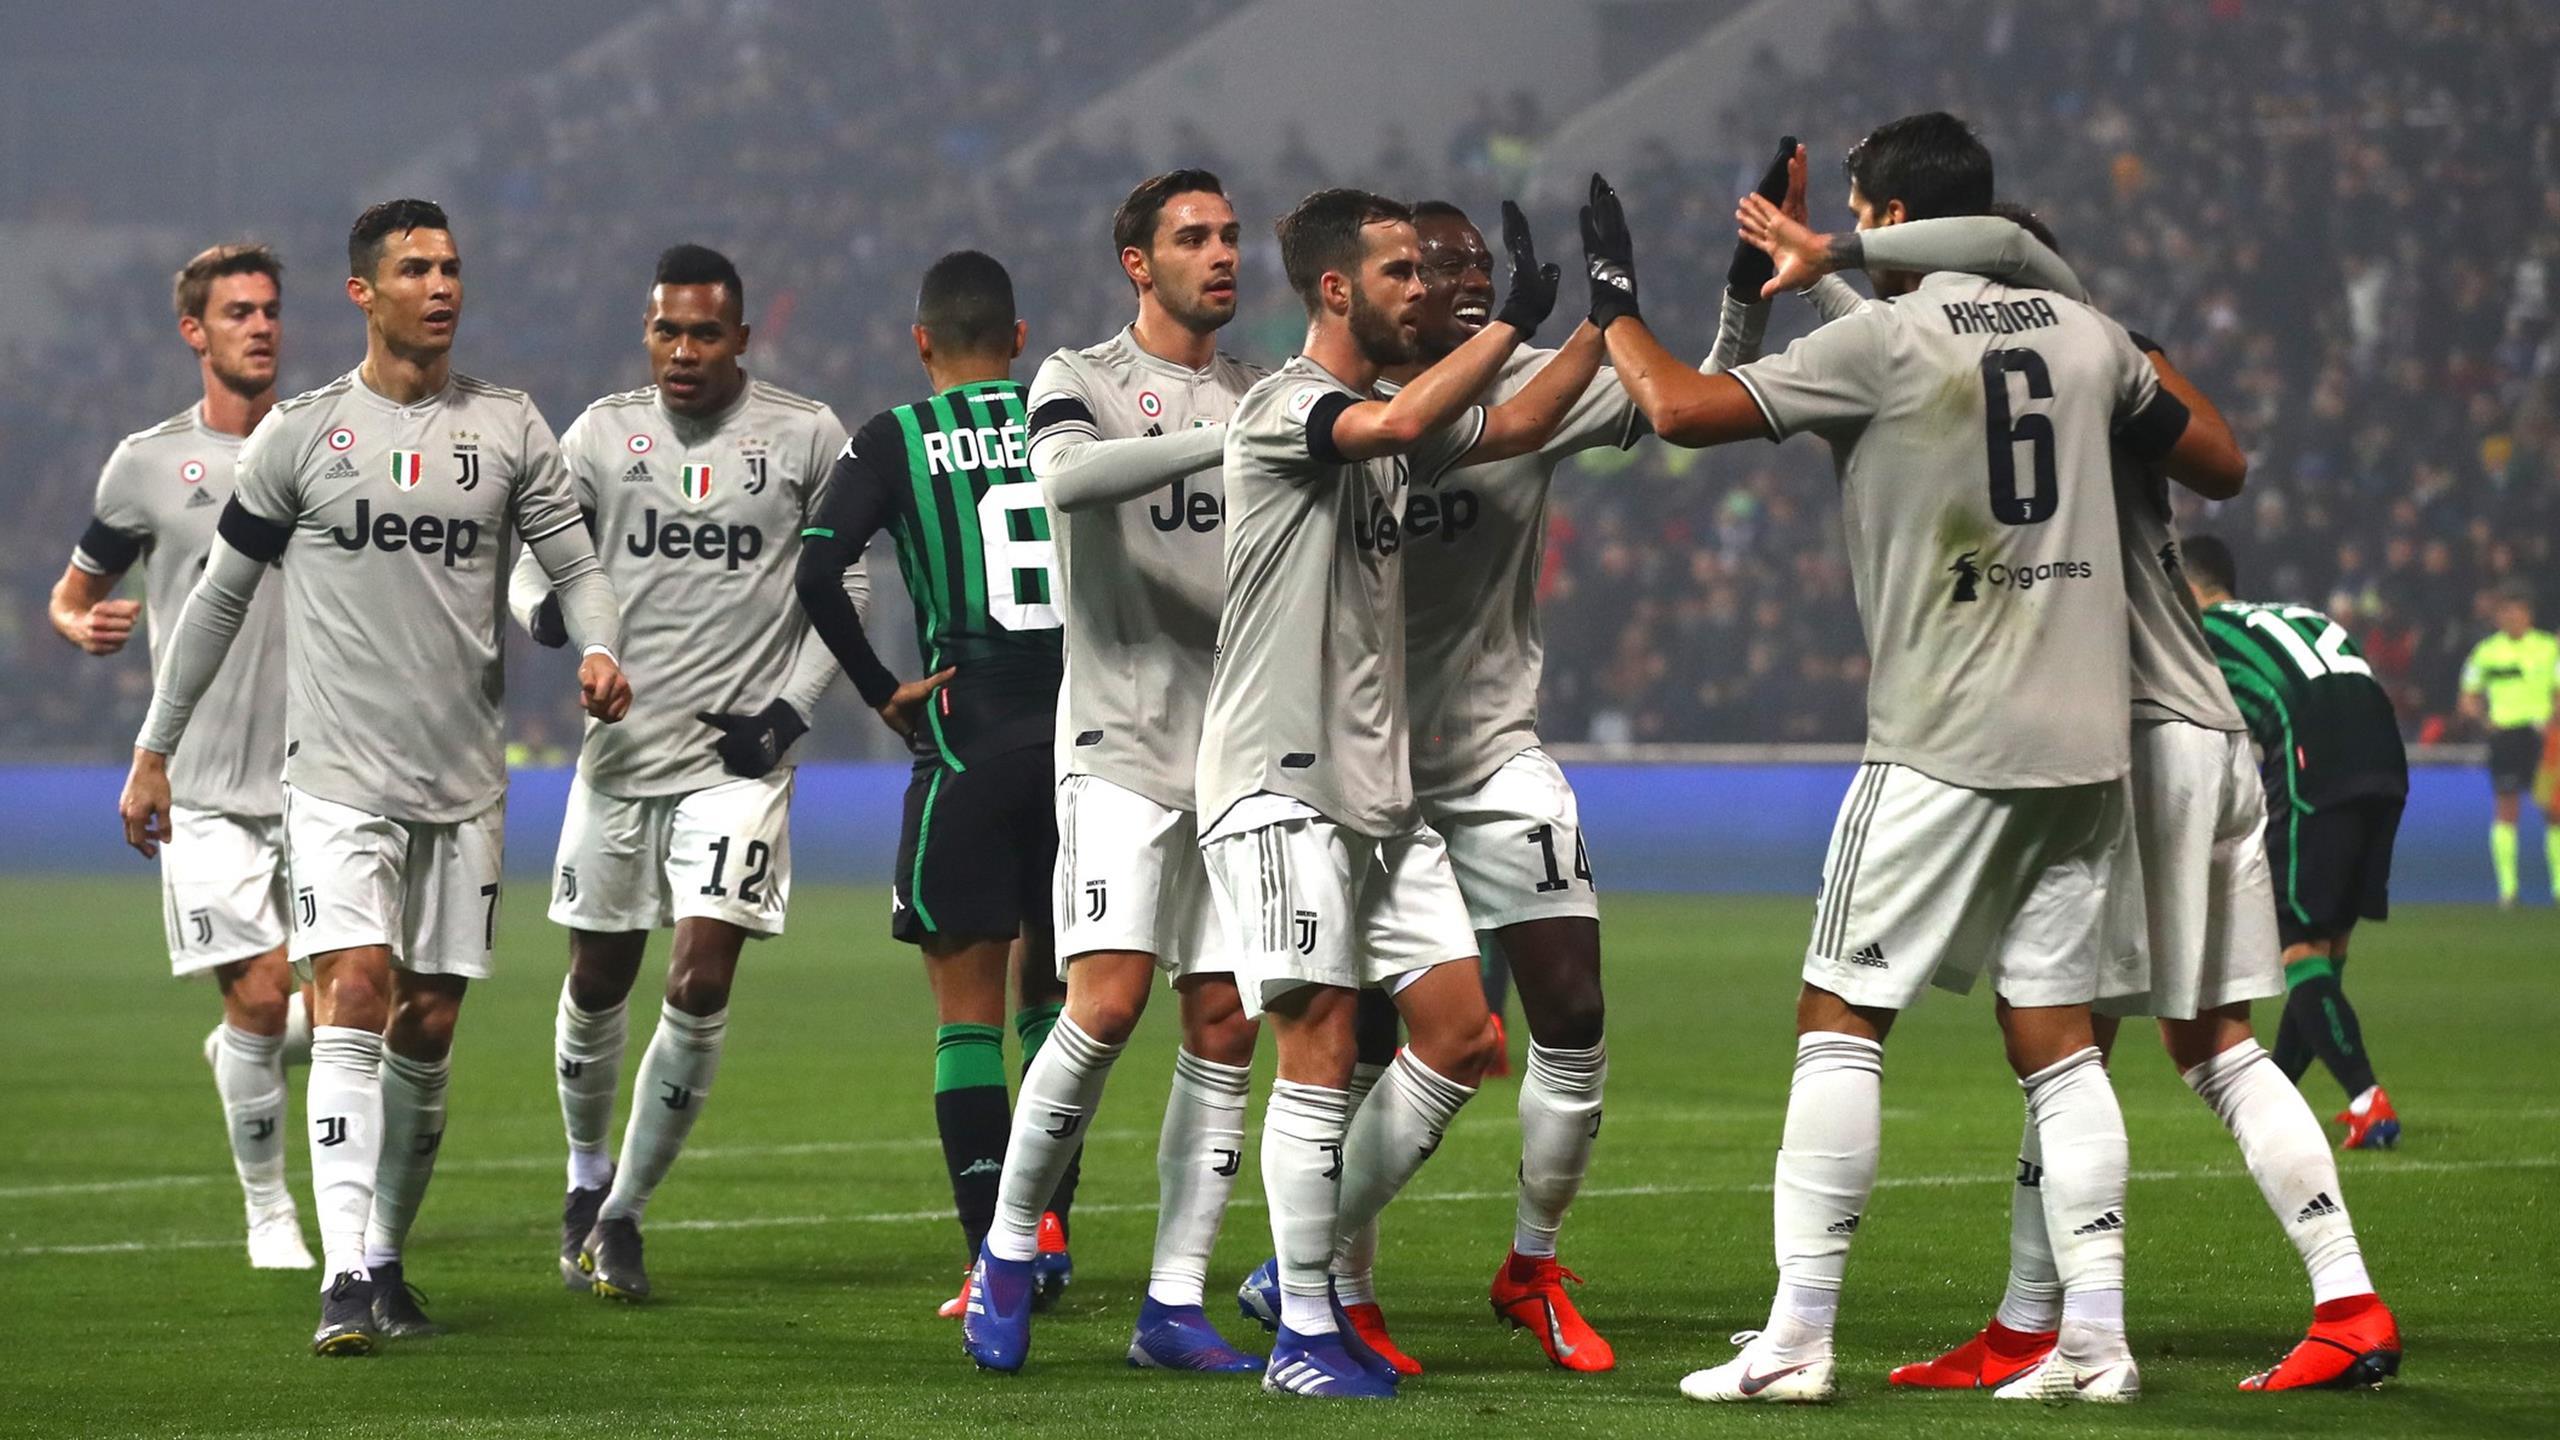 Sassuolo Juventus In Diretta Tv E Live Streaming Serie A 2018 2019 Calcio Eurosport